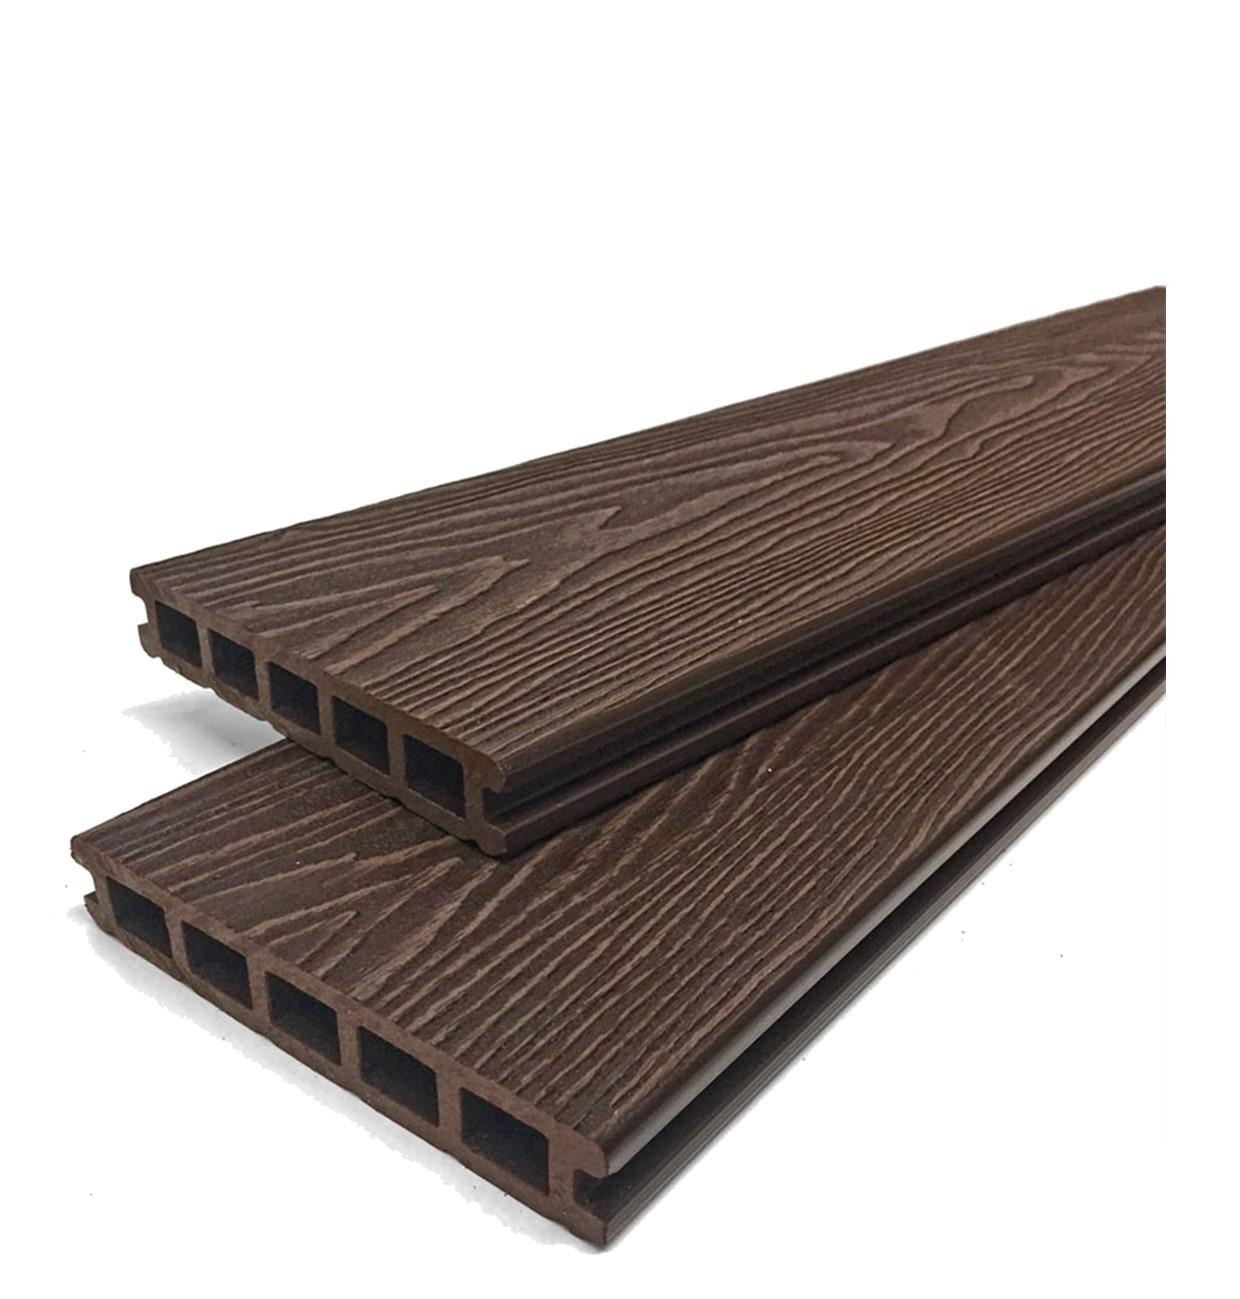 Mahogany Brown Reversible Woodgrain Composite Decking Kit 3.6m Boards (Price per sqm/£27 per board)